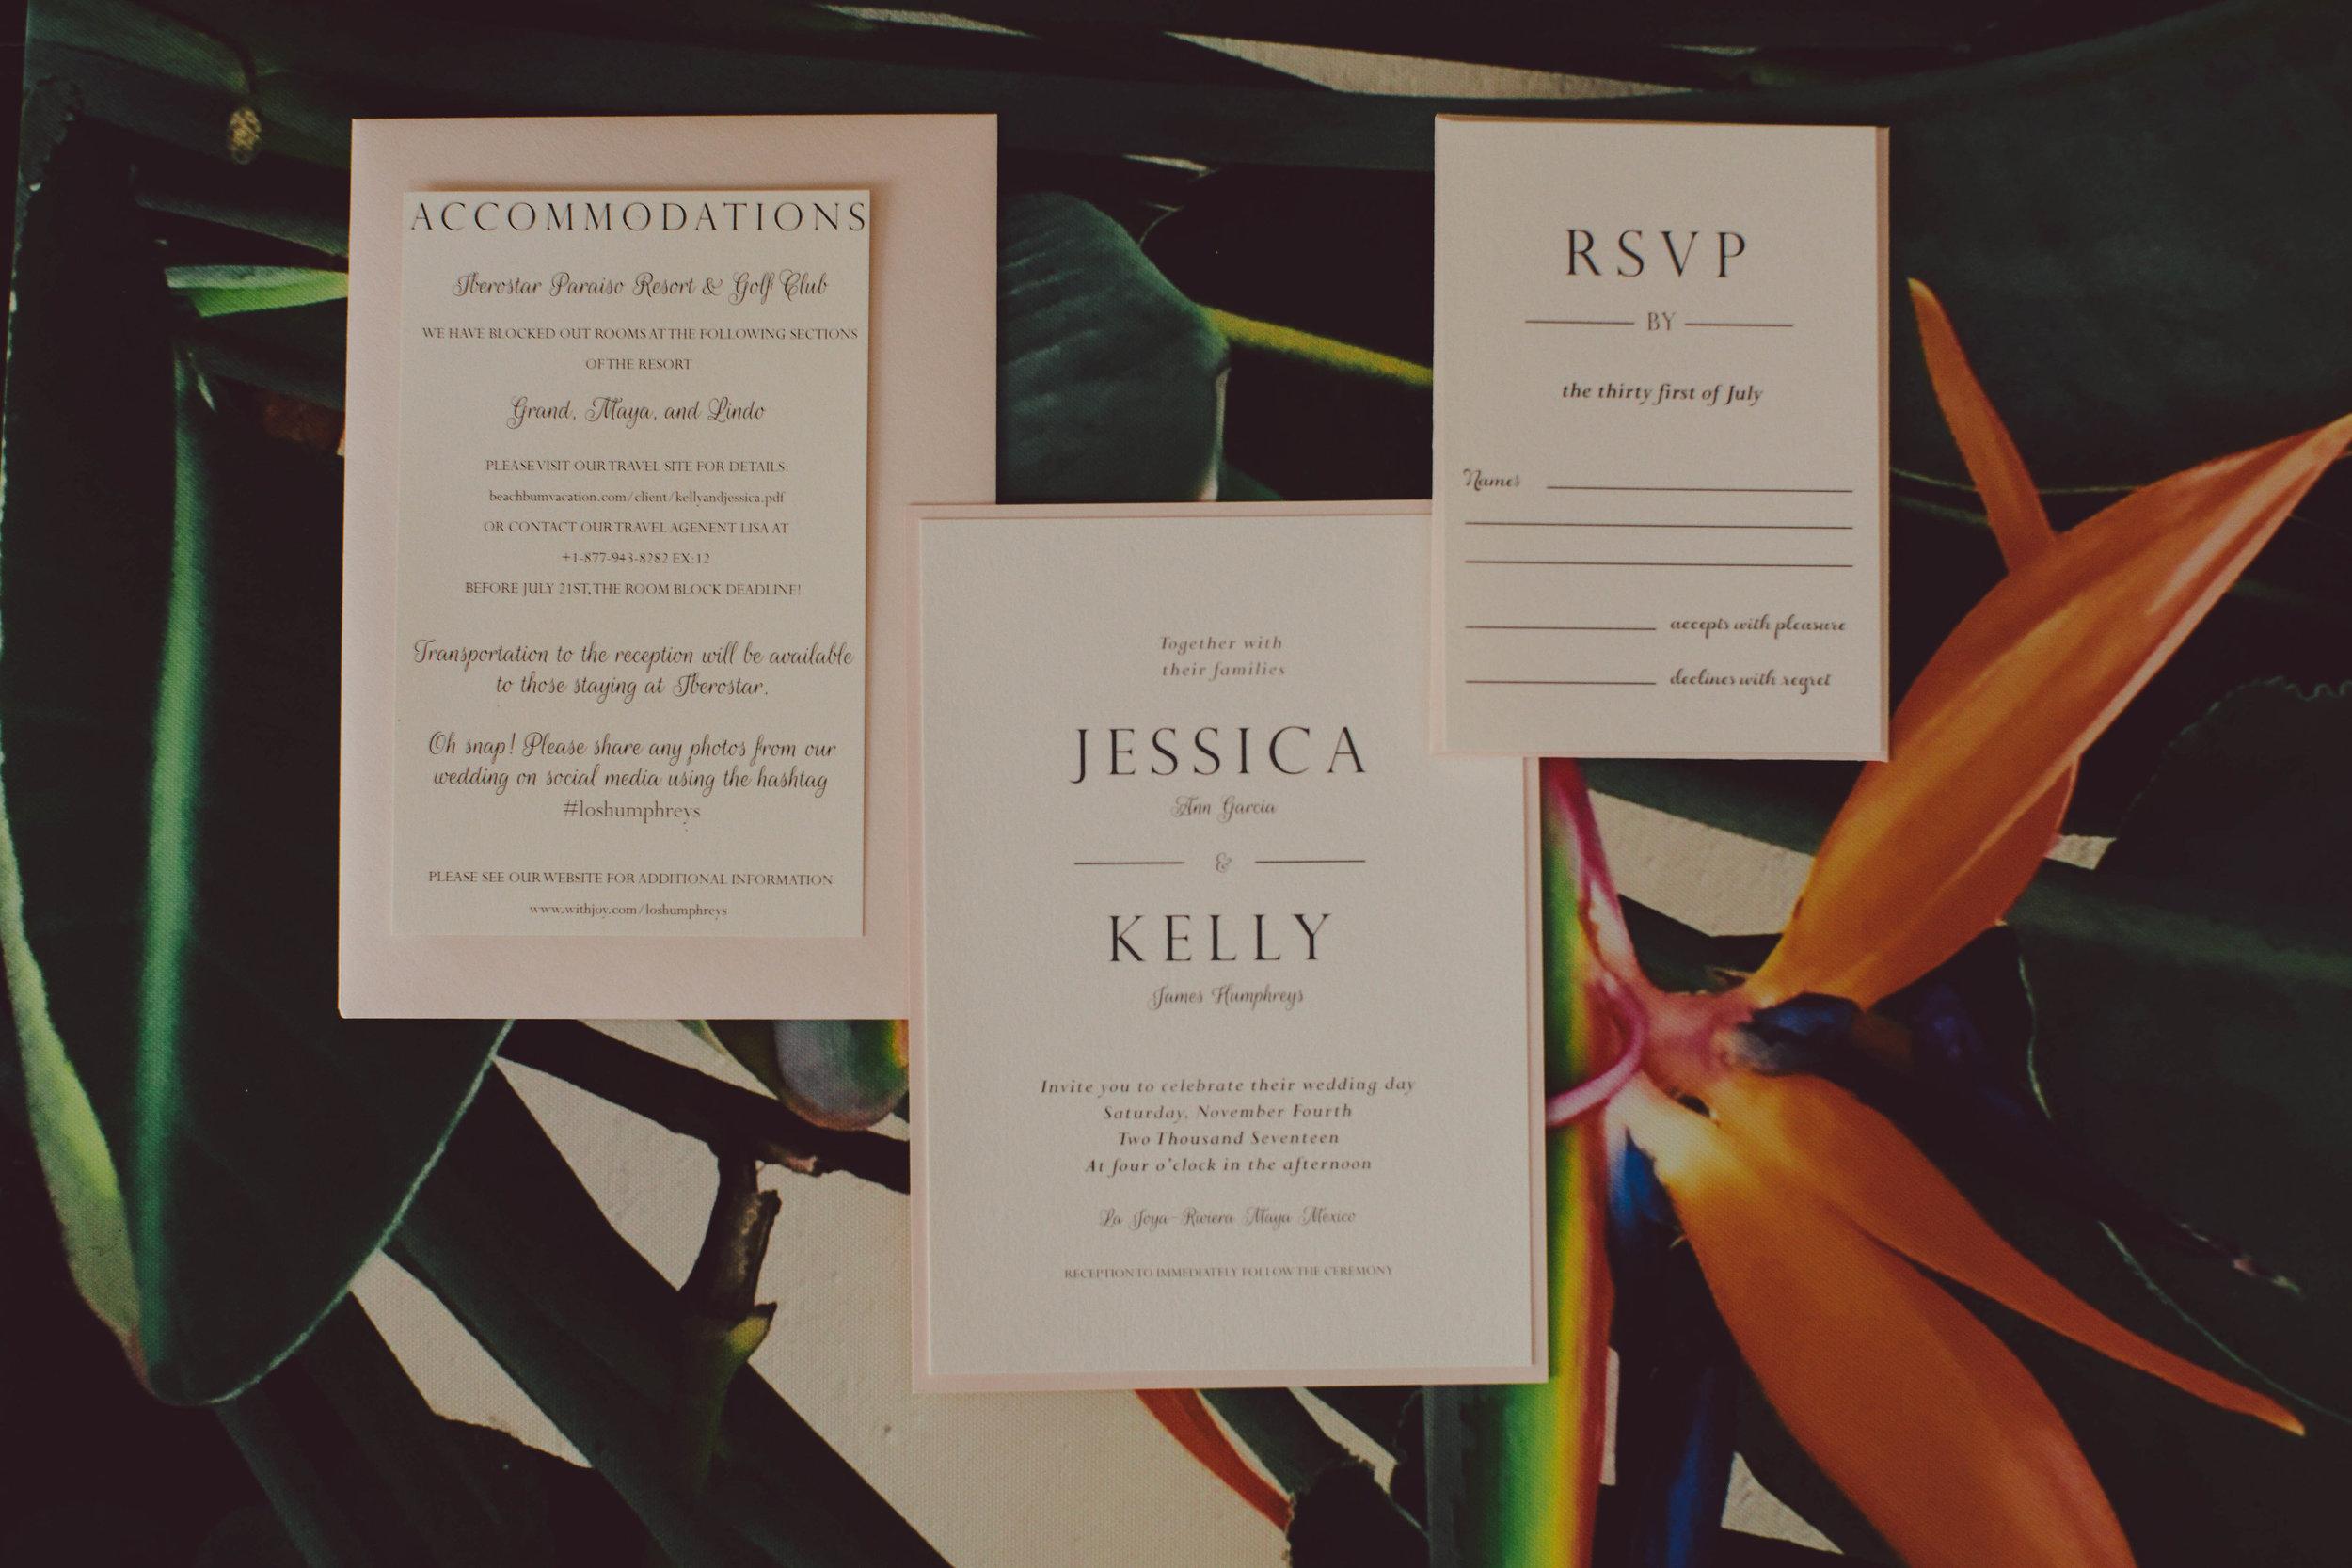 mexico_wedding_cancun_villa_la_joya_evangeline_lane_015a.jpg